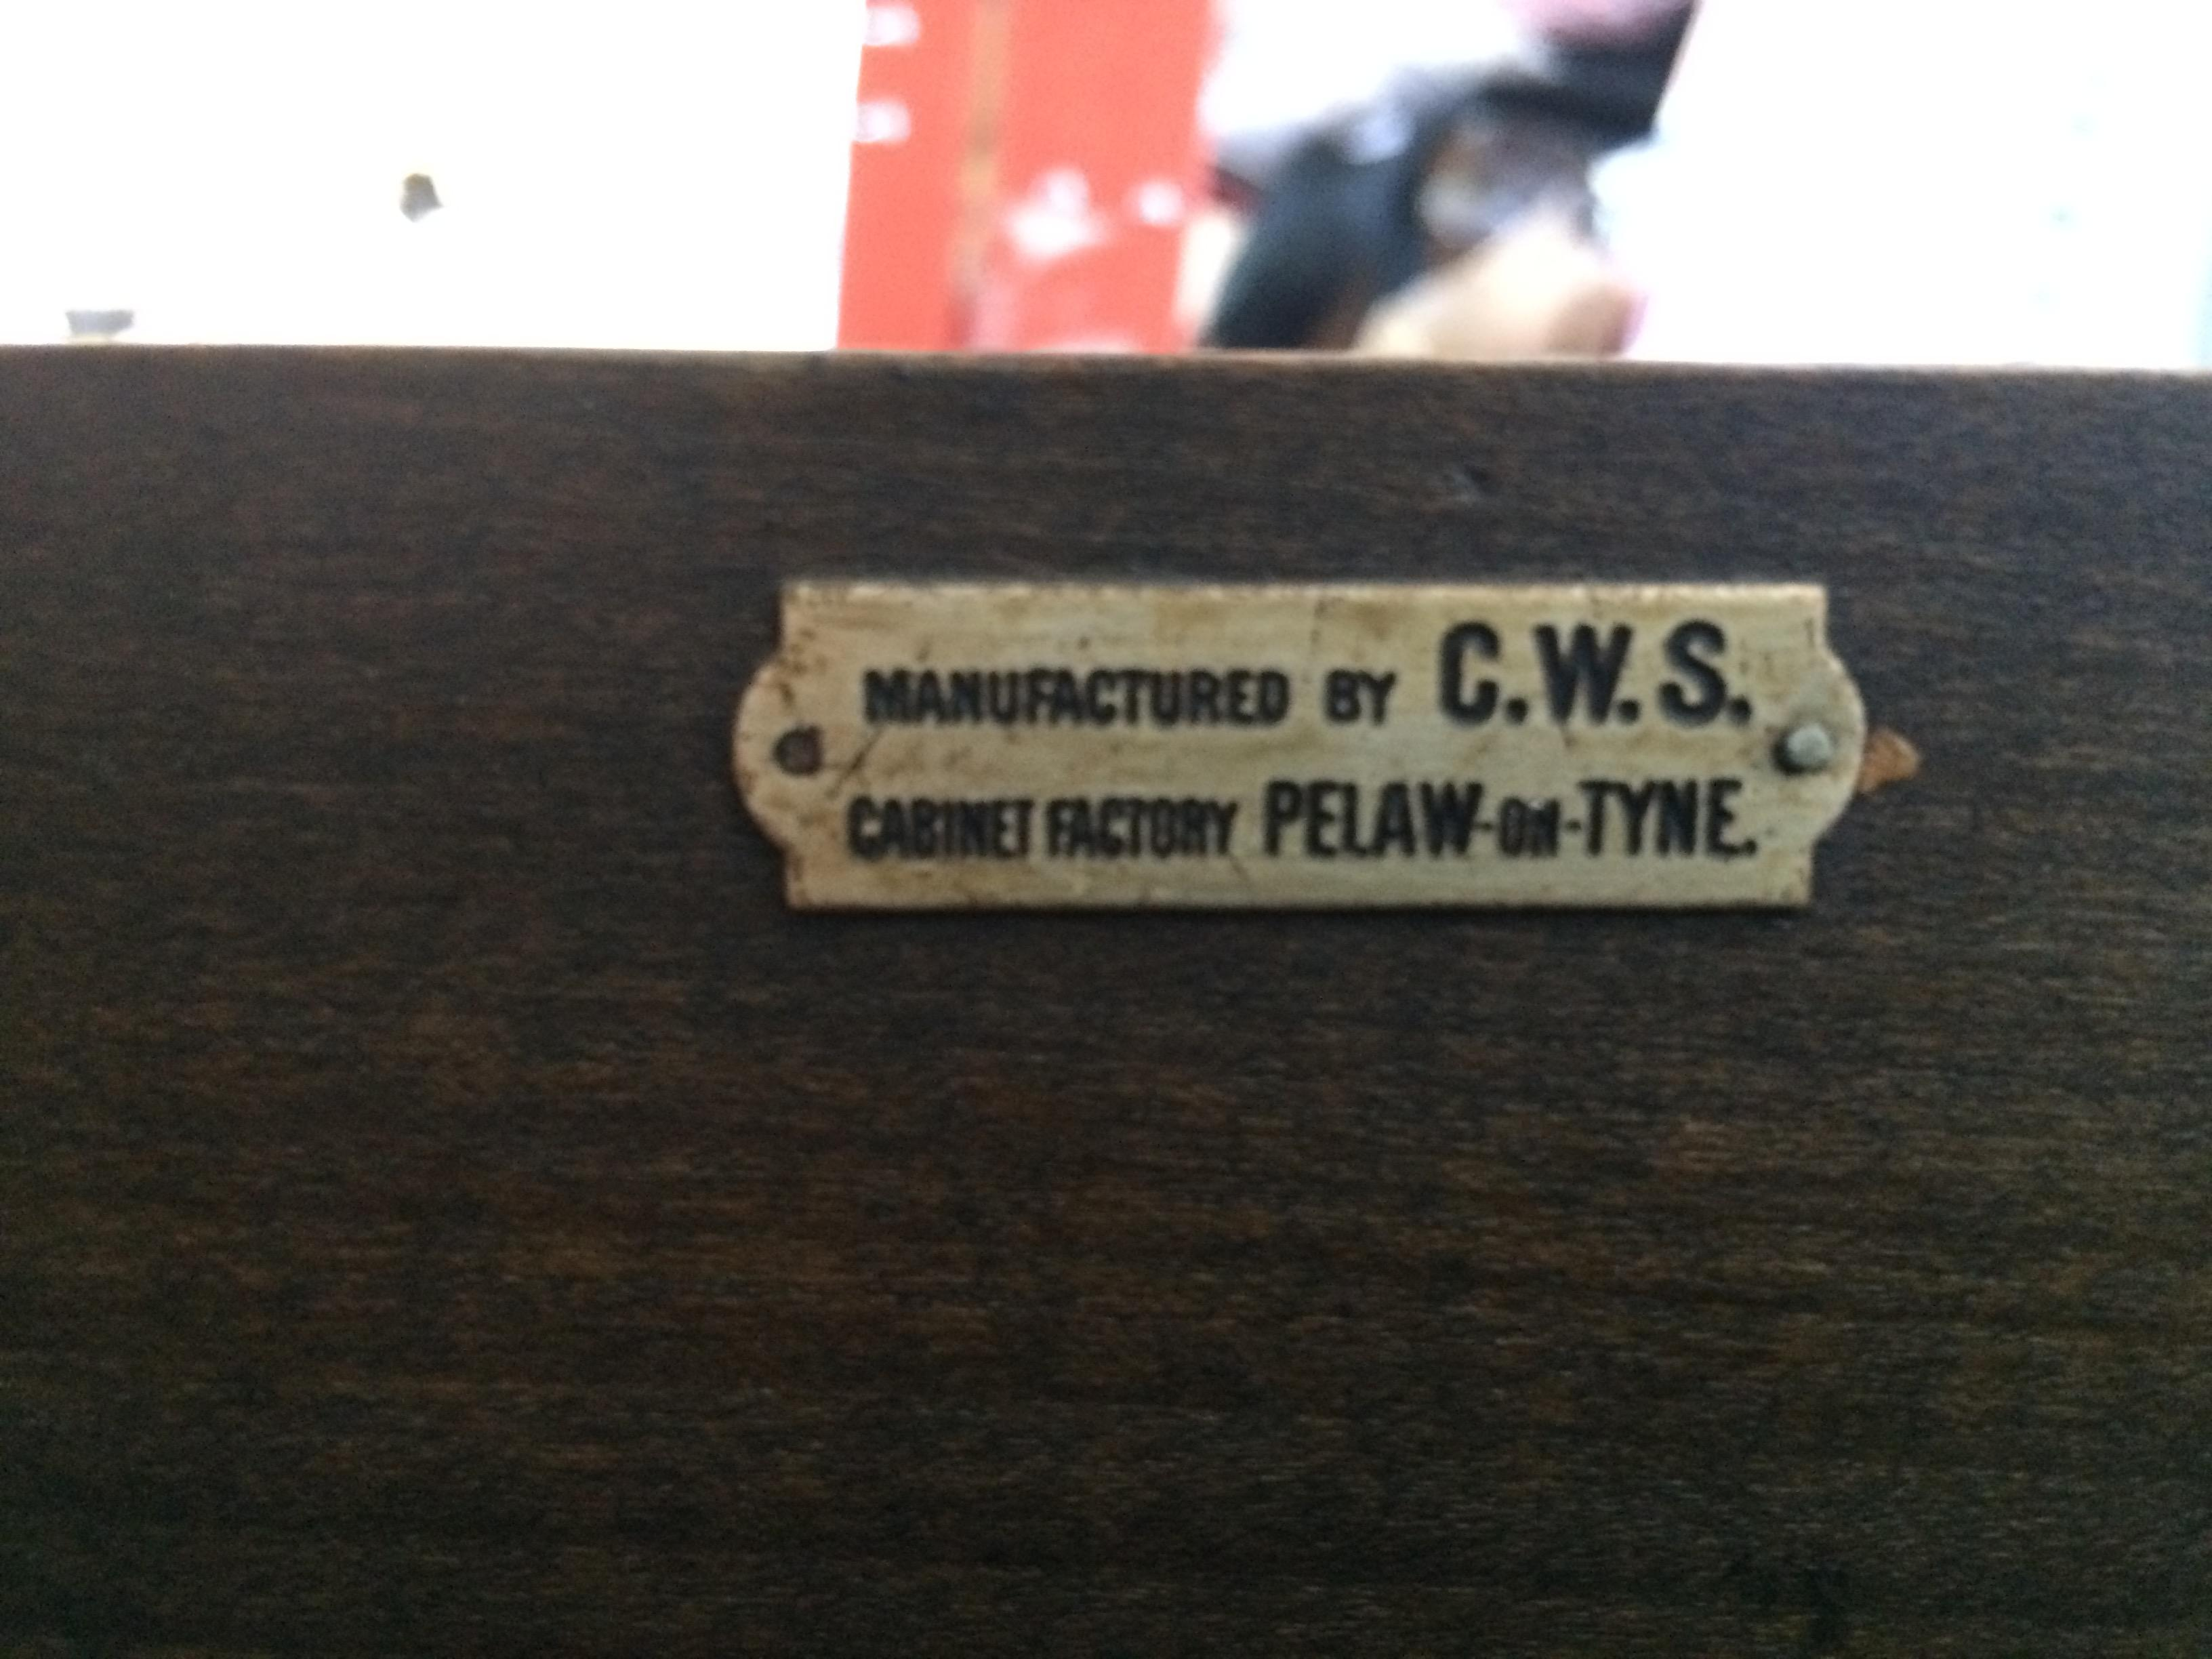 cws pelaw antique. CWS Cabinet Factory Pelaw-on-Tyne Cws Pelaw Antique E